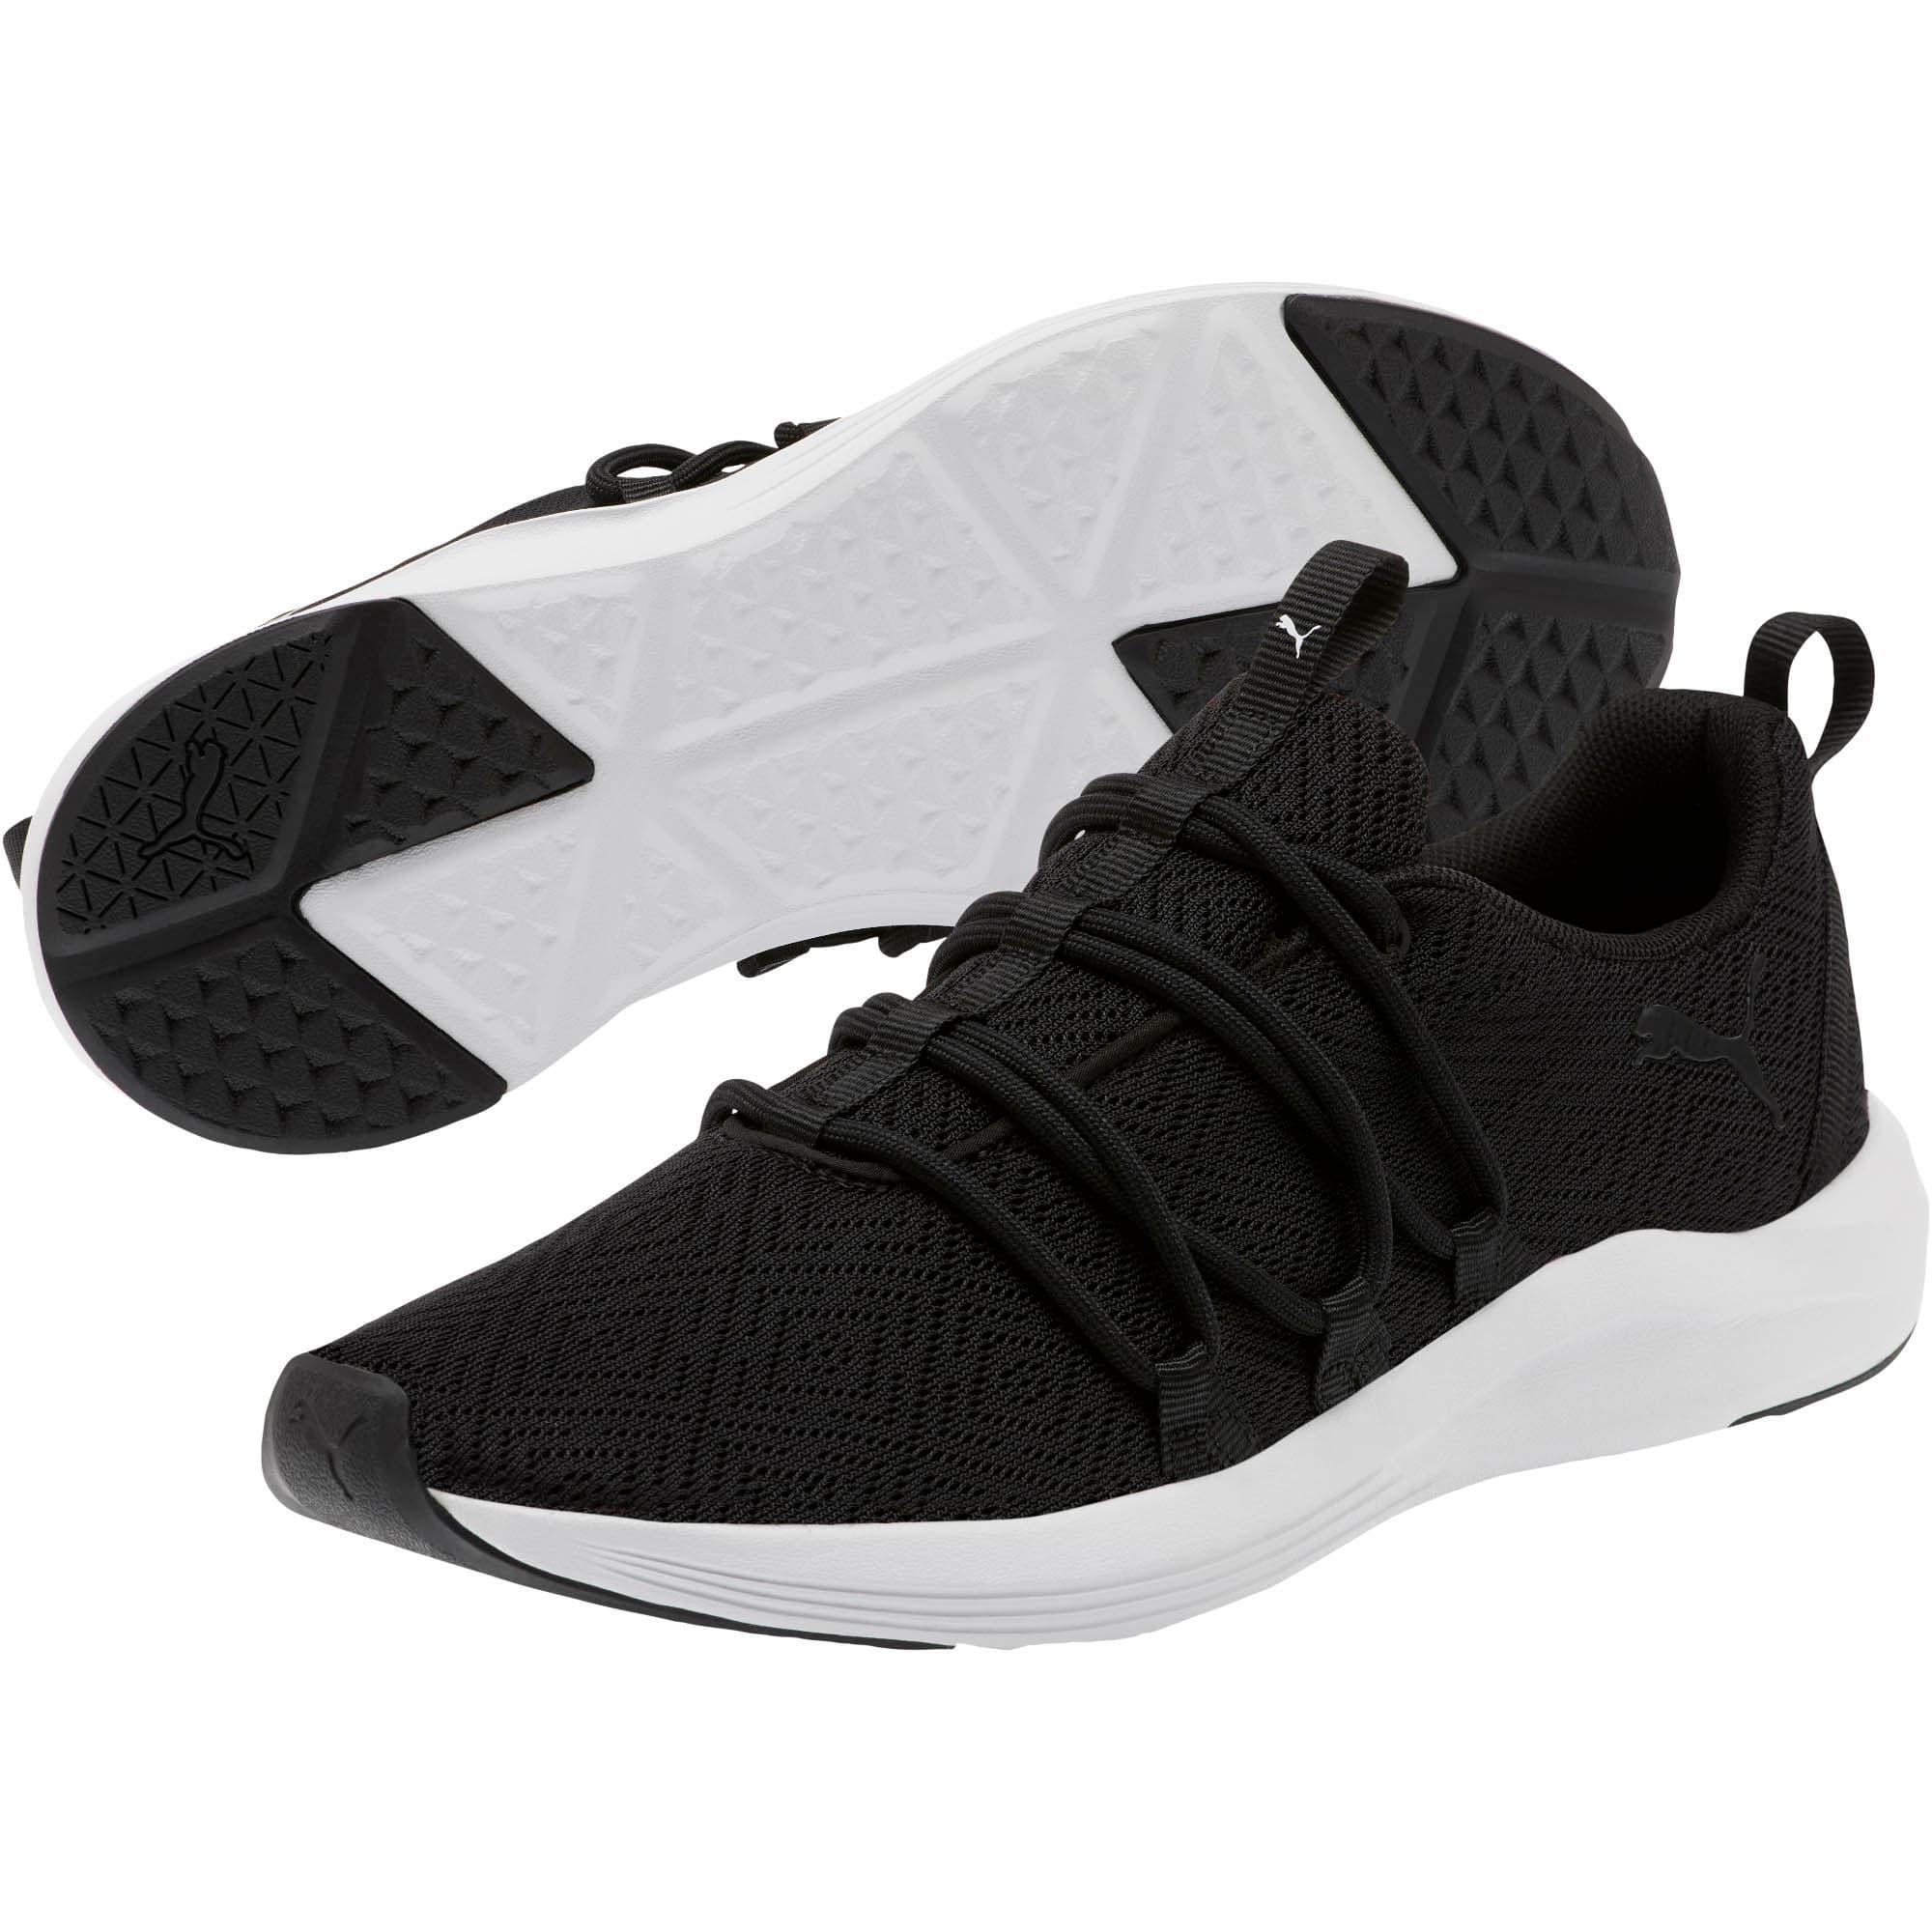 Thumbnail 2 of Prowl Alt Stellar Women's Training Shoes, Puma Black-Puma White, medium